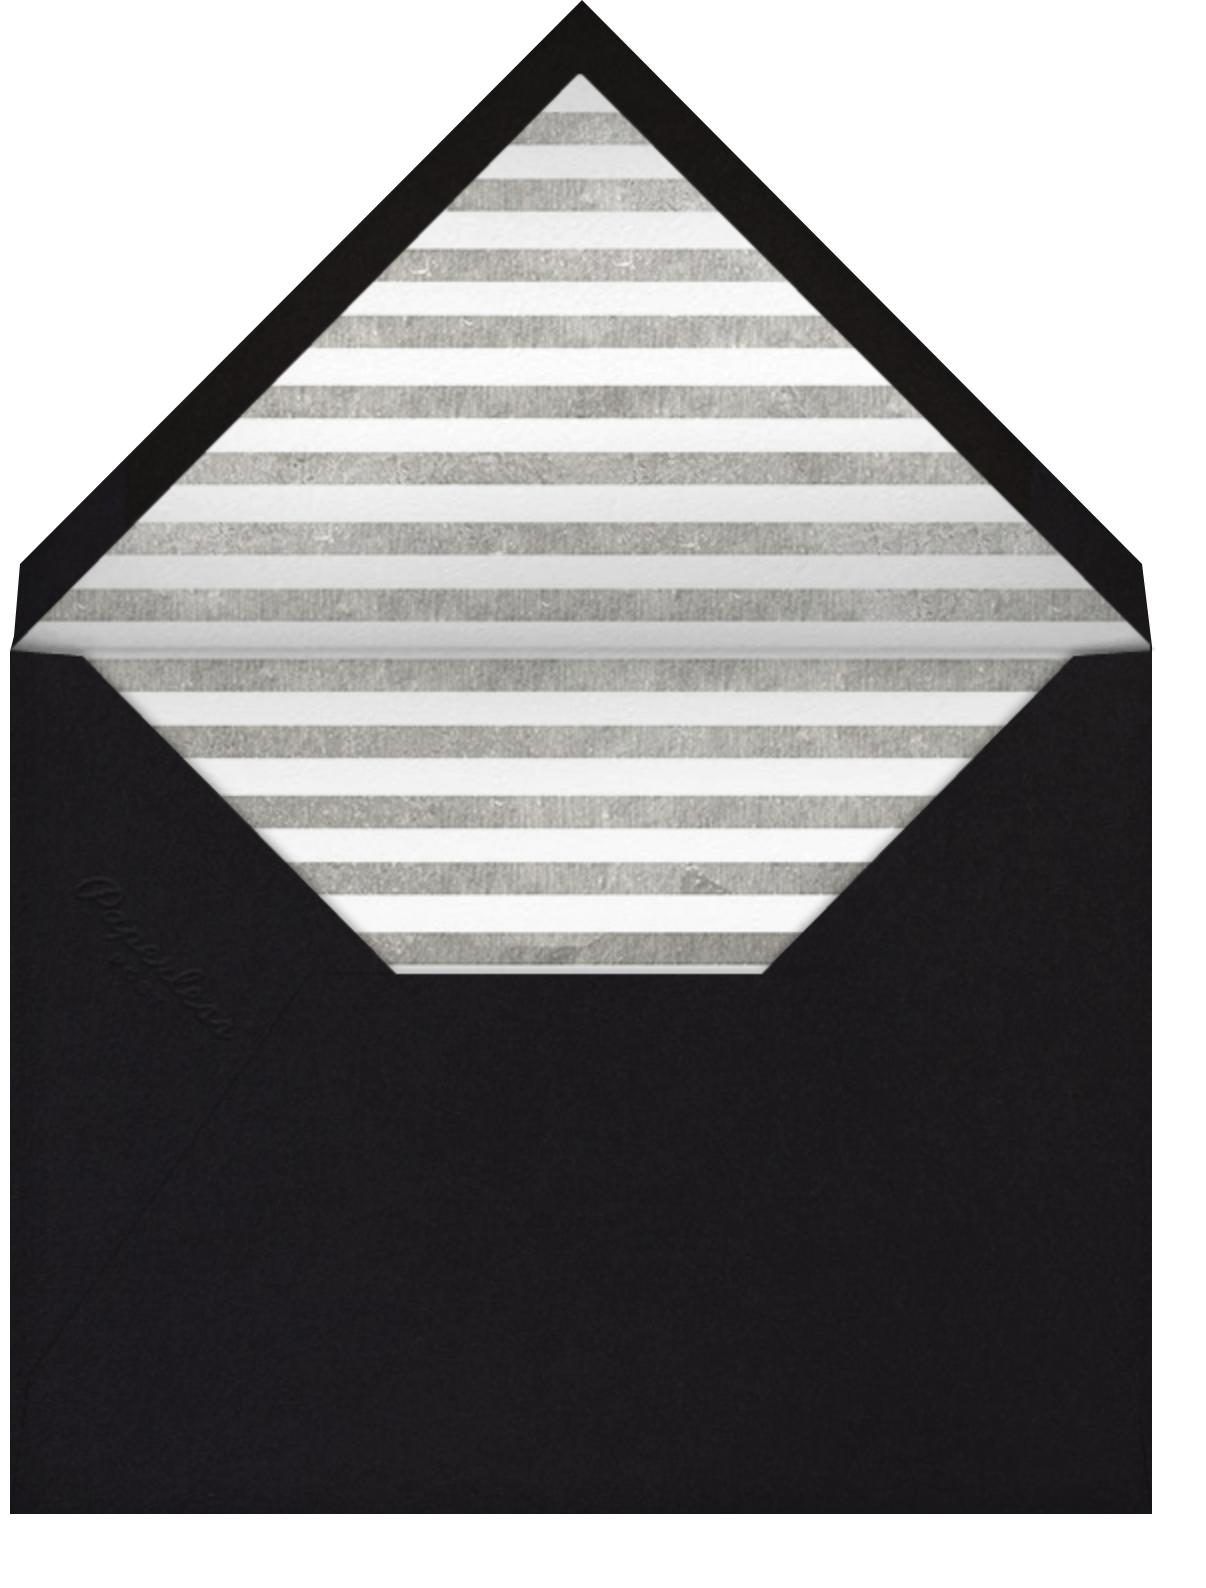 Confetti New Year (Greeting) - Silver/Black - kate spade new york - Envelope